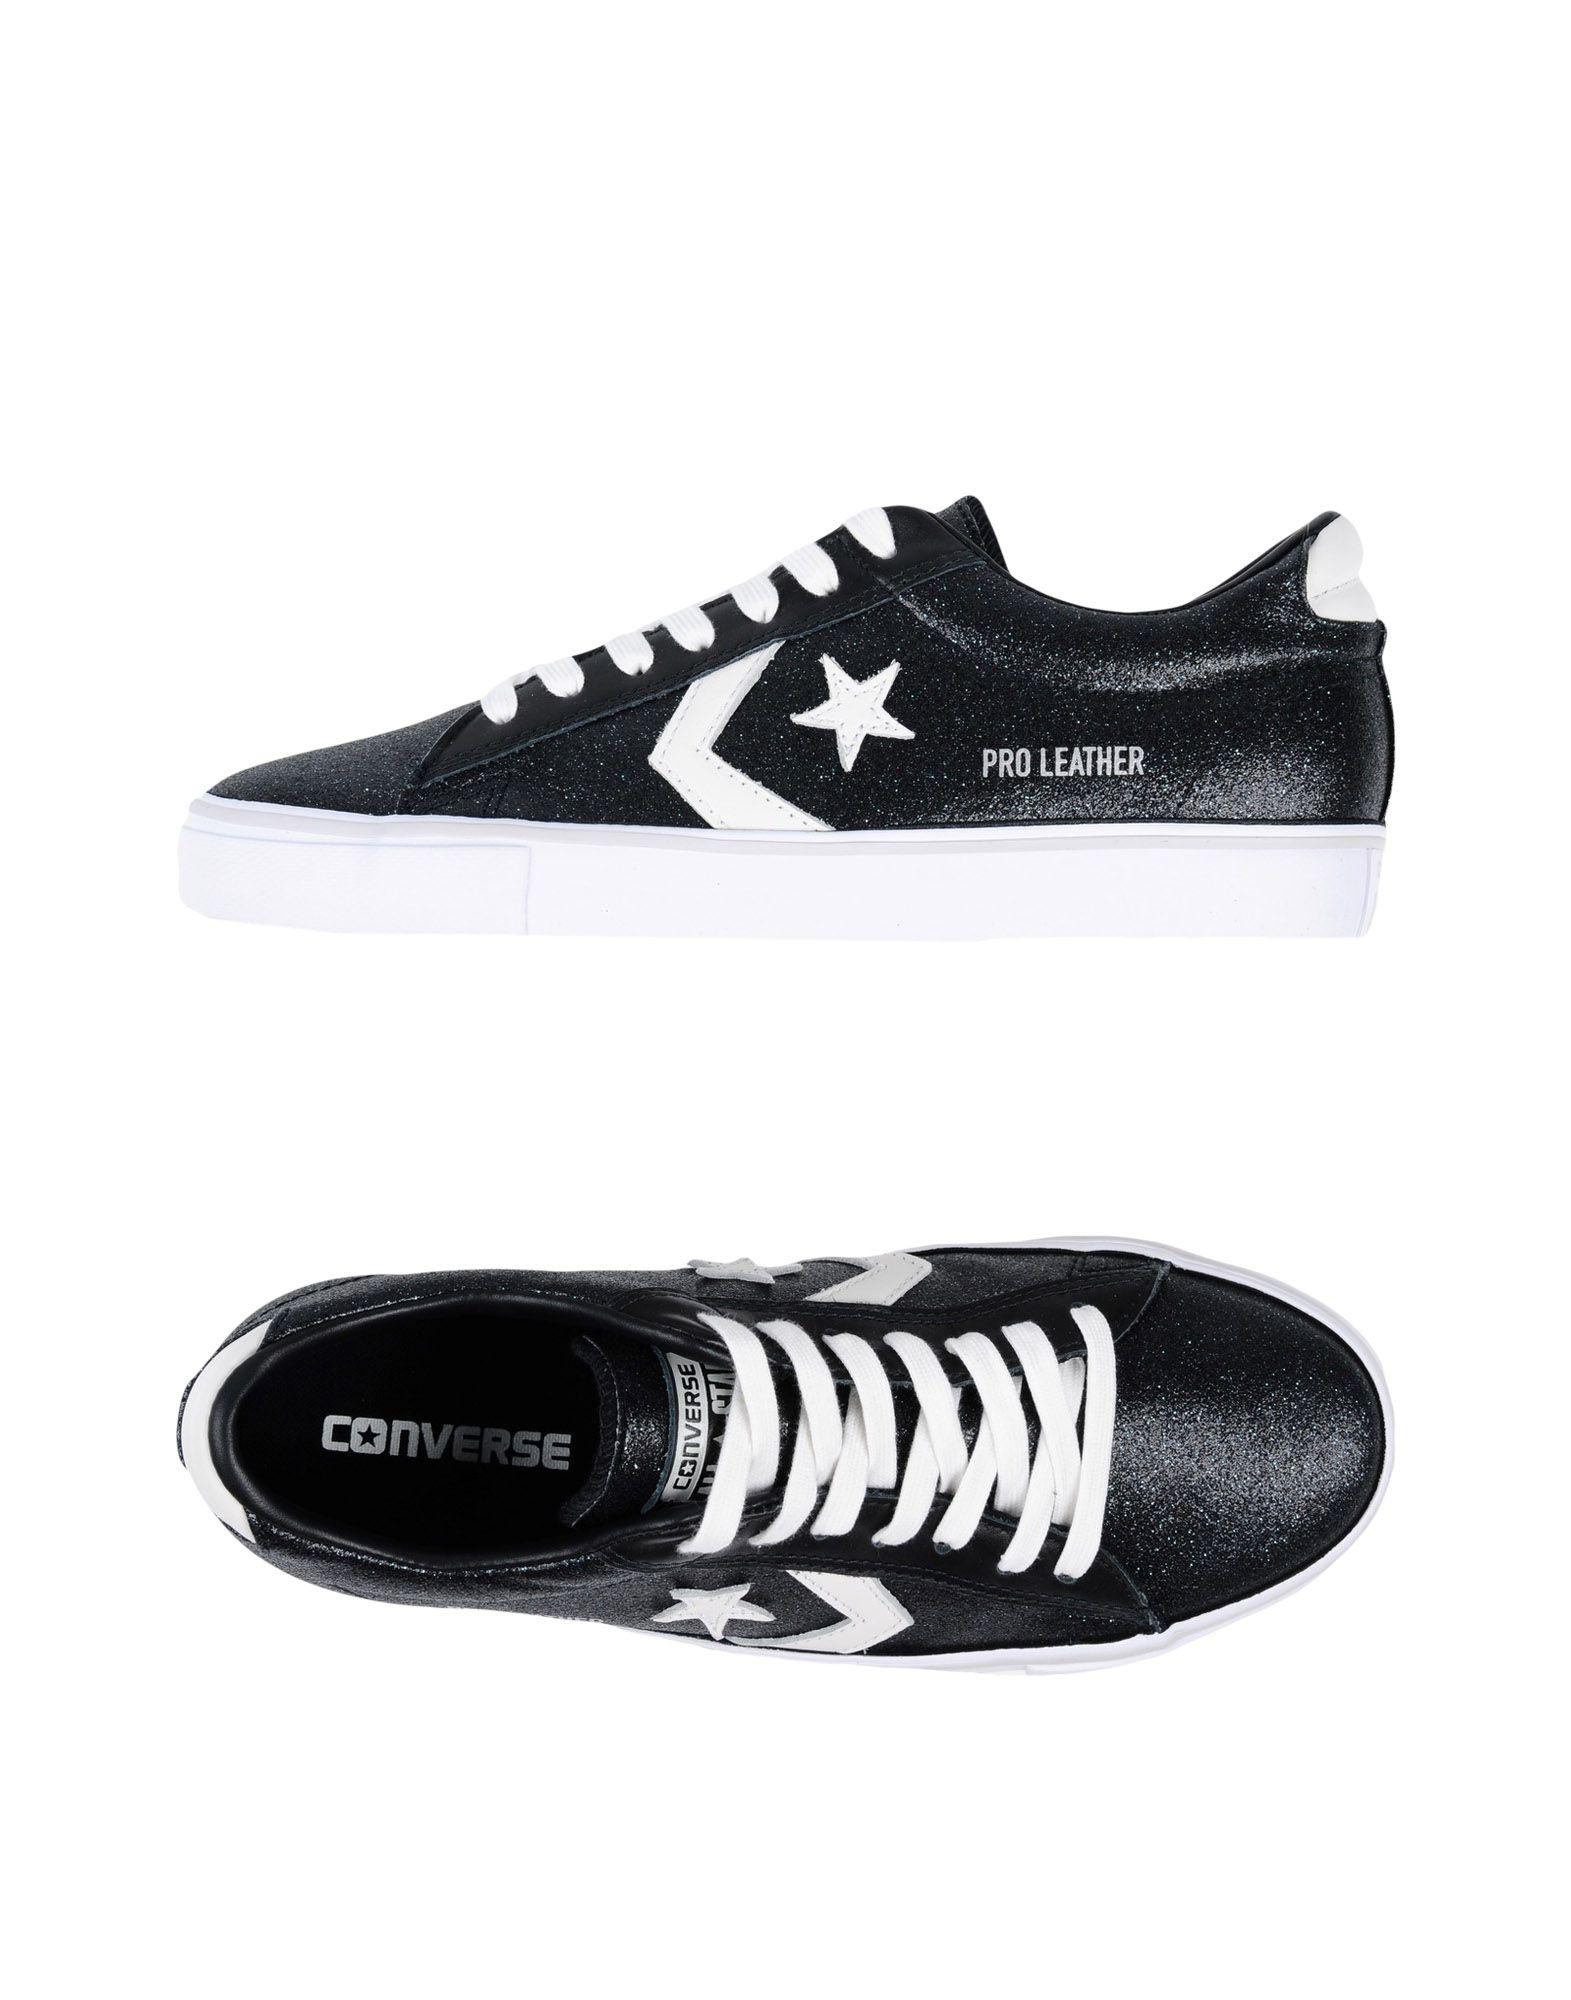 Sneakers Converse All Star Pro Leather Vulc Glitter - - - Donna - 11437694GB dcd2f3